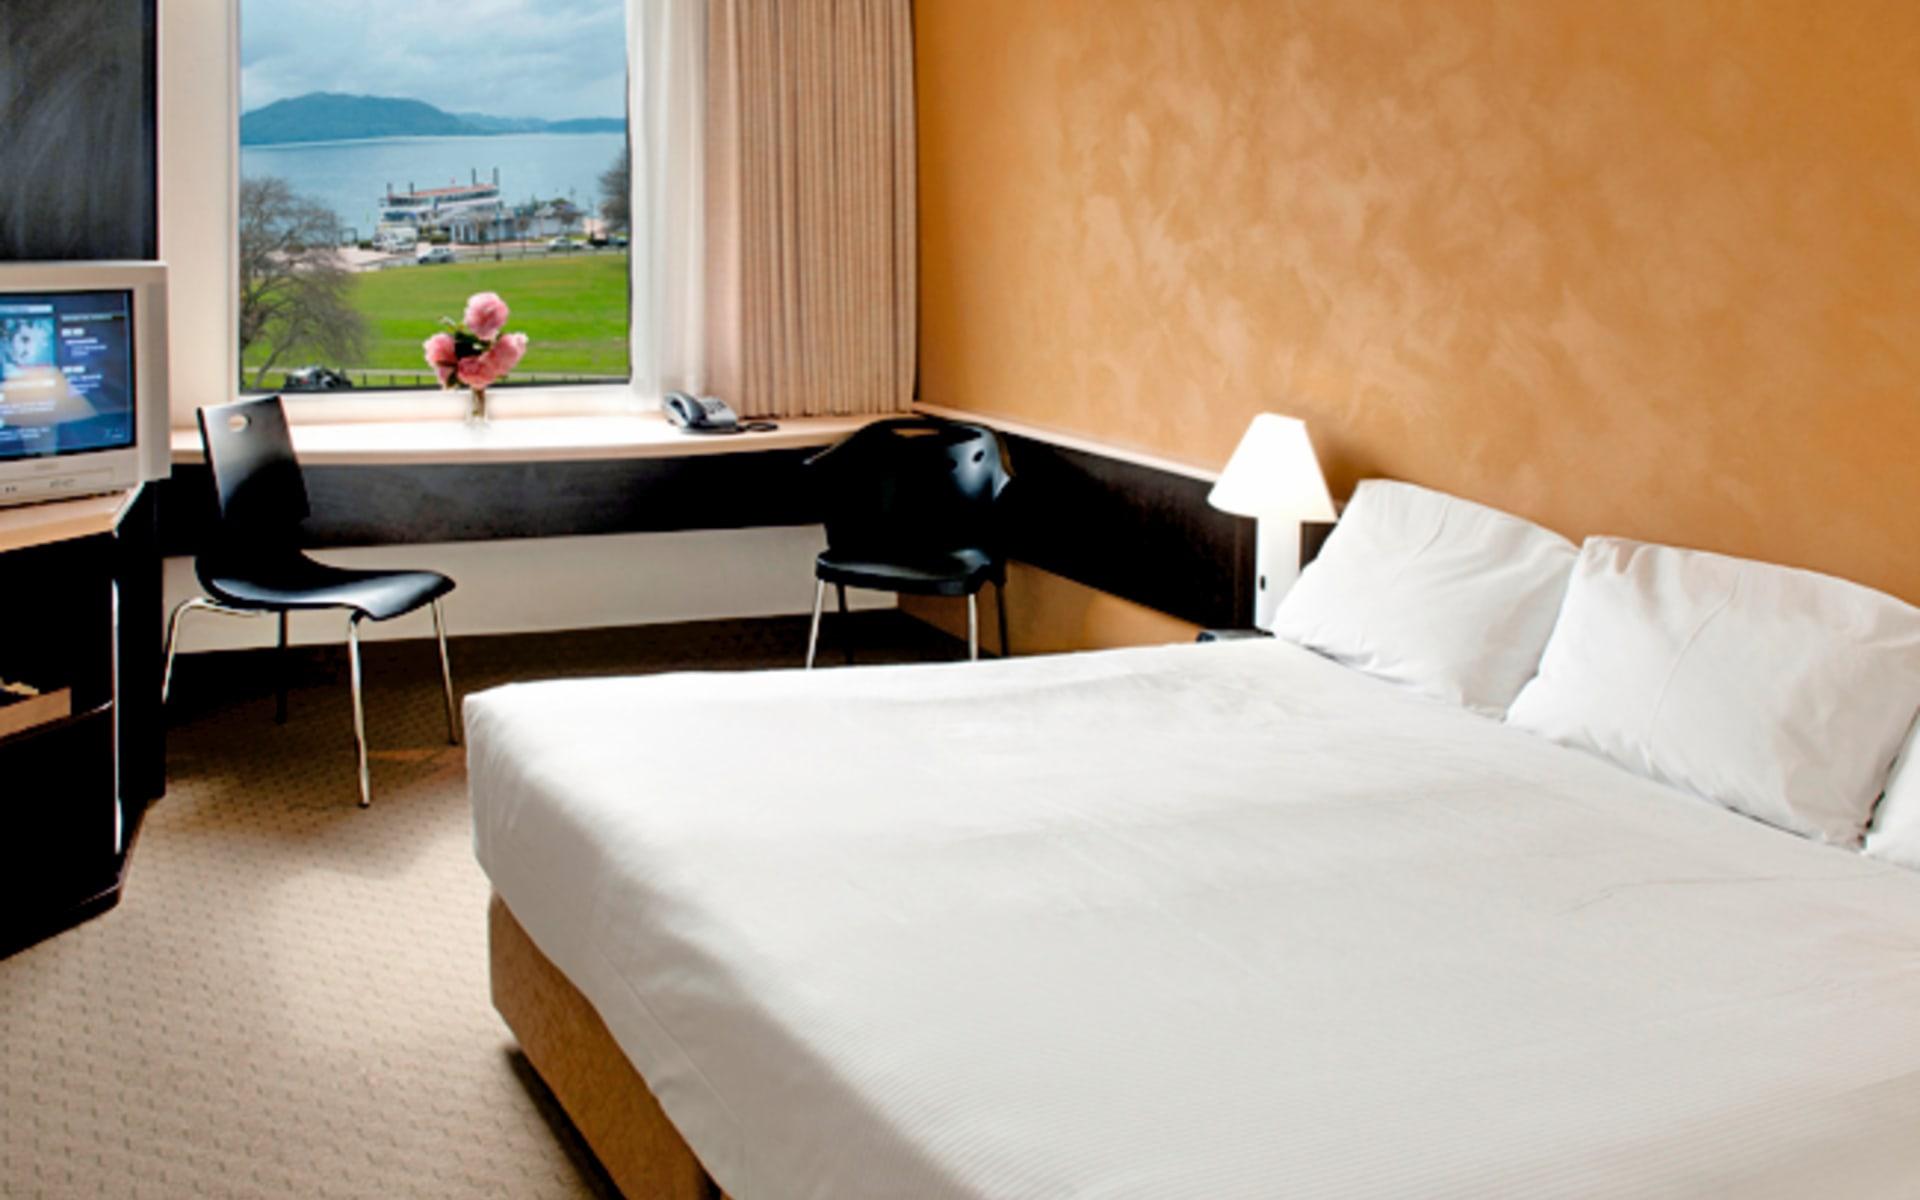 Hotel Ibis Rotorua:  Hotel Ibis Rotorua - Superior Lakeside Room